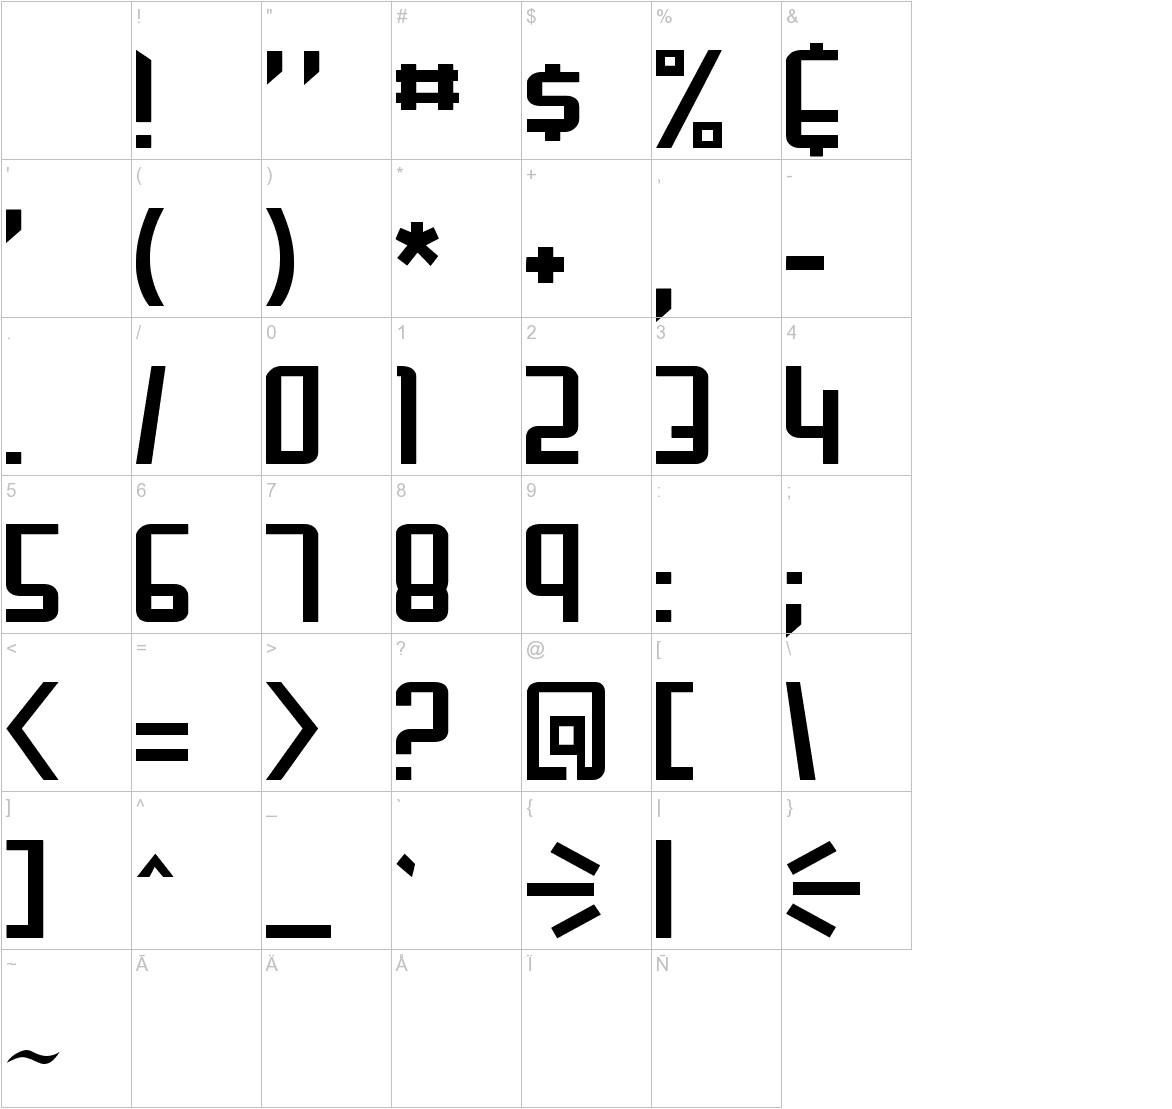 Gunblade characters